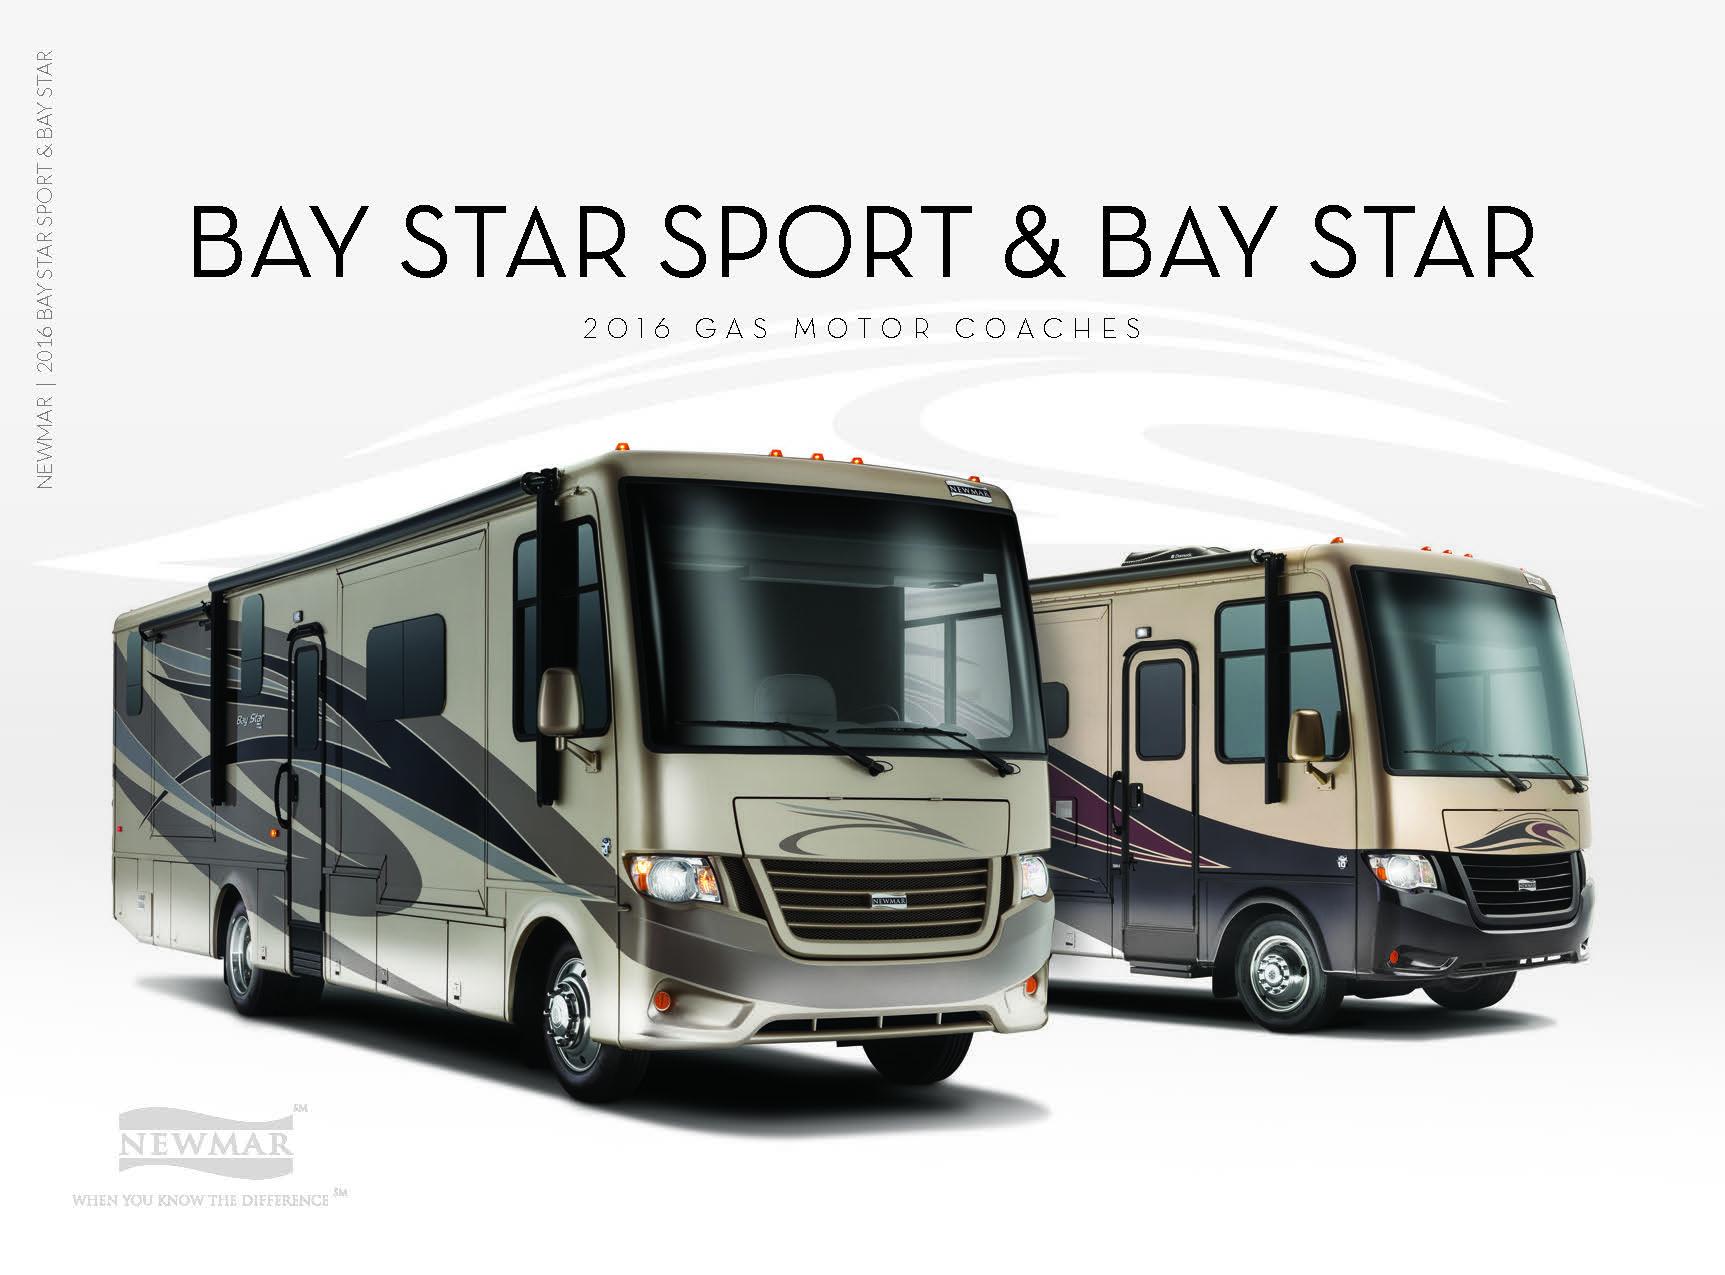 2016 Bay Star, Bay Star Sport